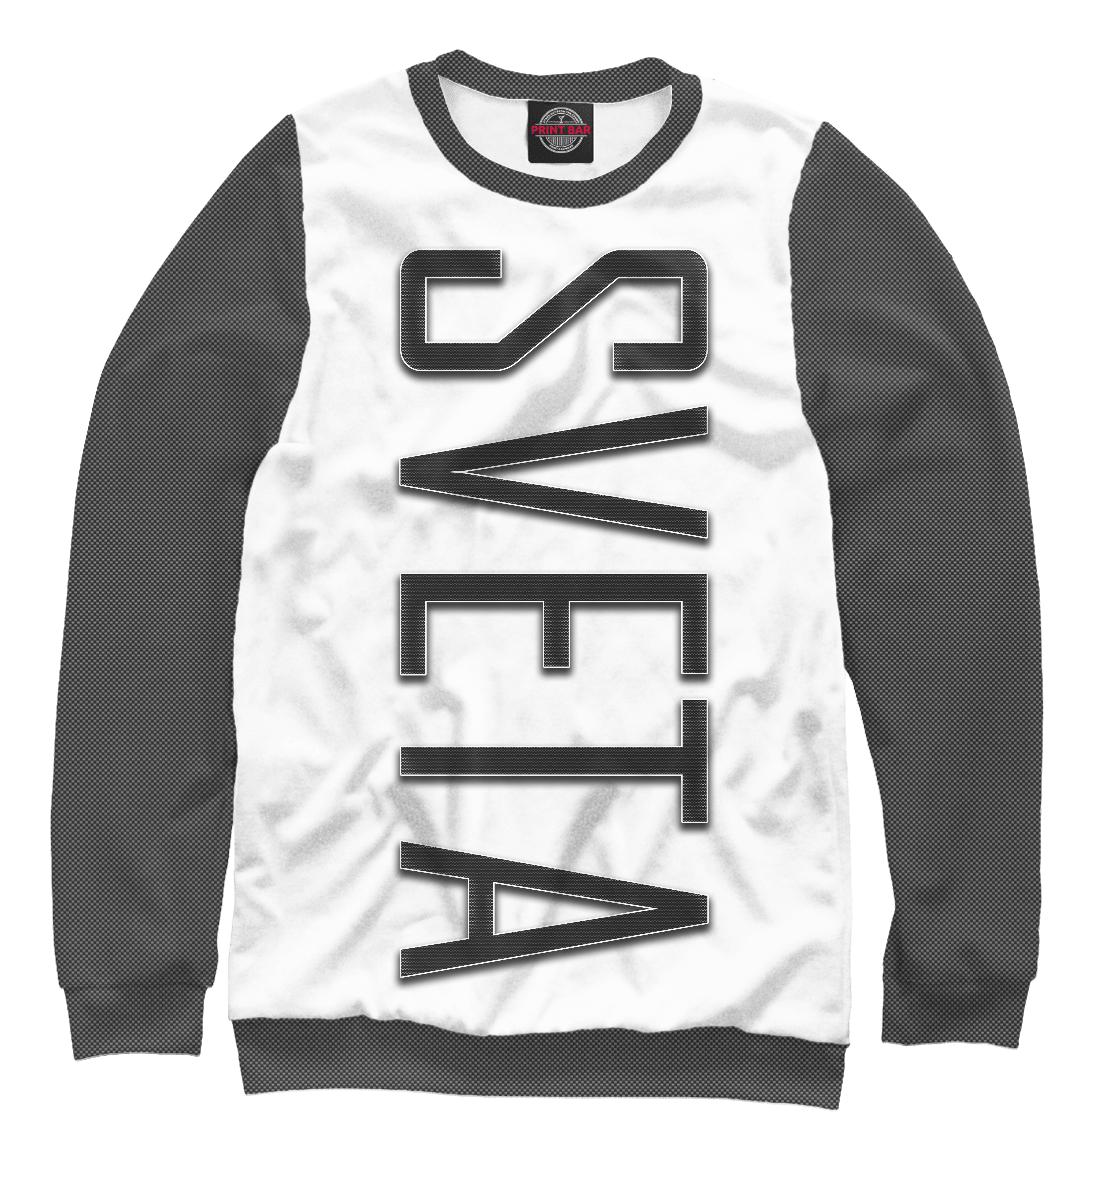 Sveta-carbon, Printbar, Свитшоты, IMR-689896-swi-2  - купить со скидкой